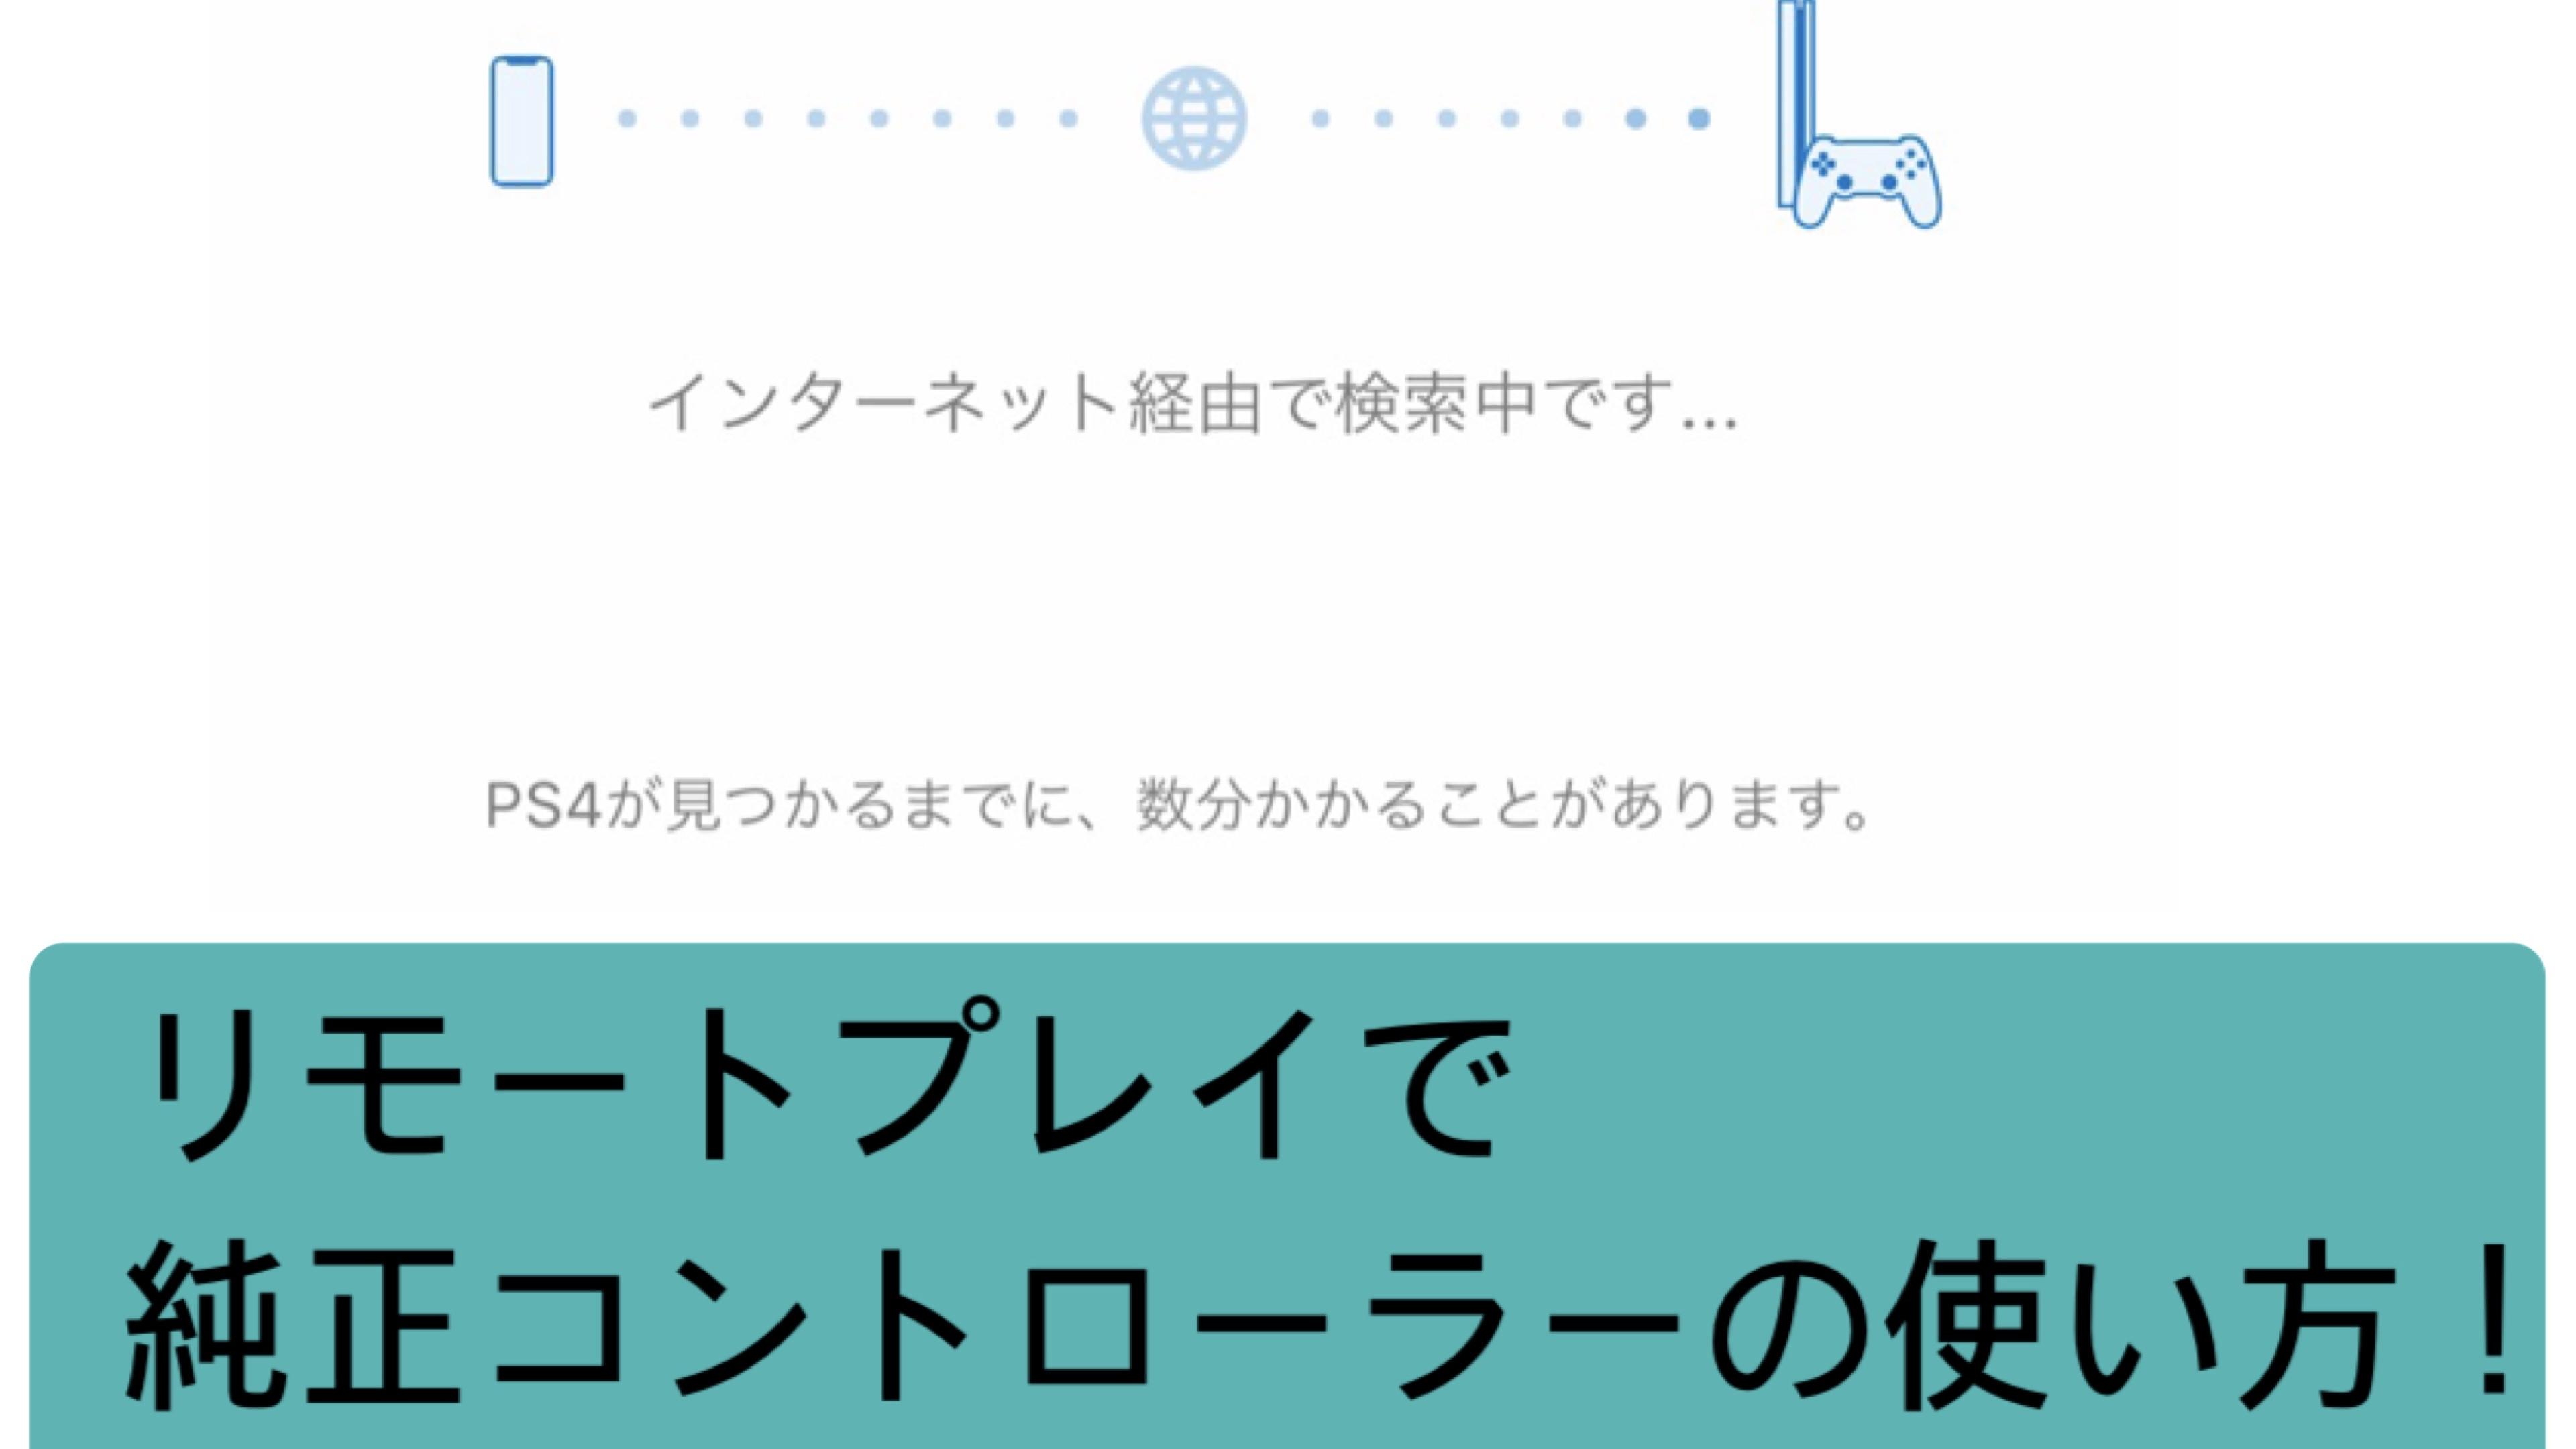 【iPhone/iPad】PS4リモートプレイで純正コントローラーの遊び方